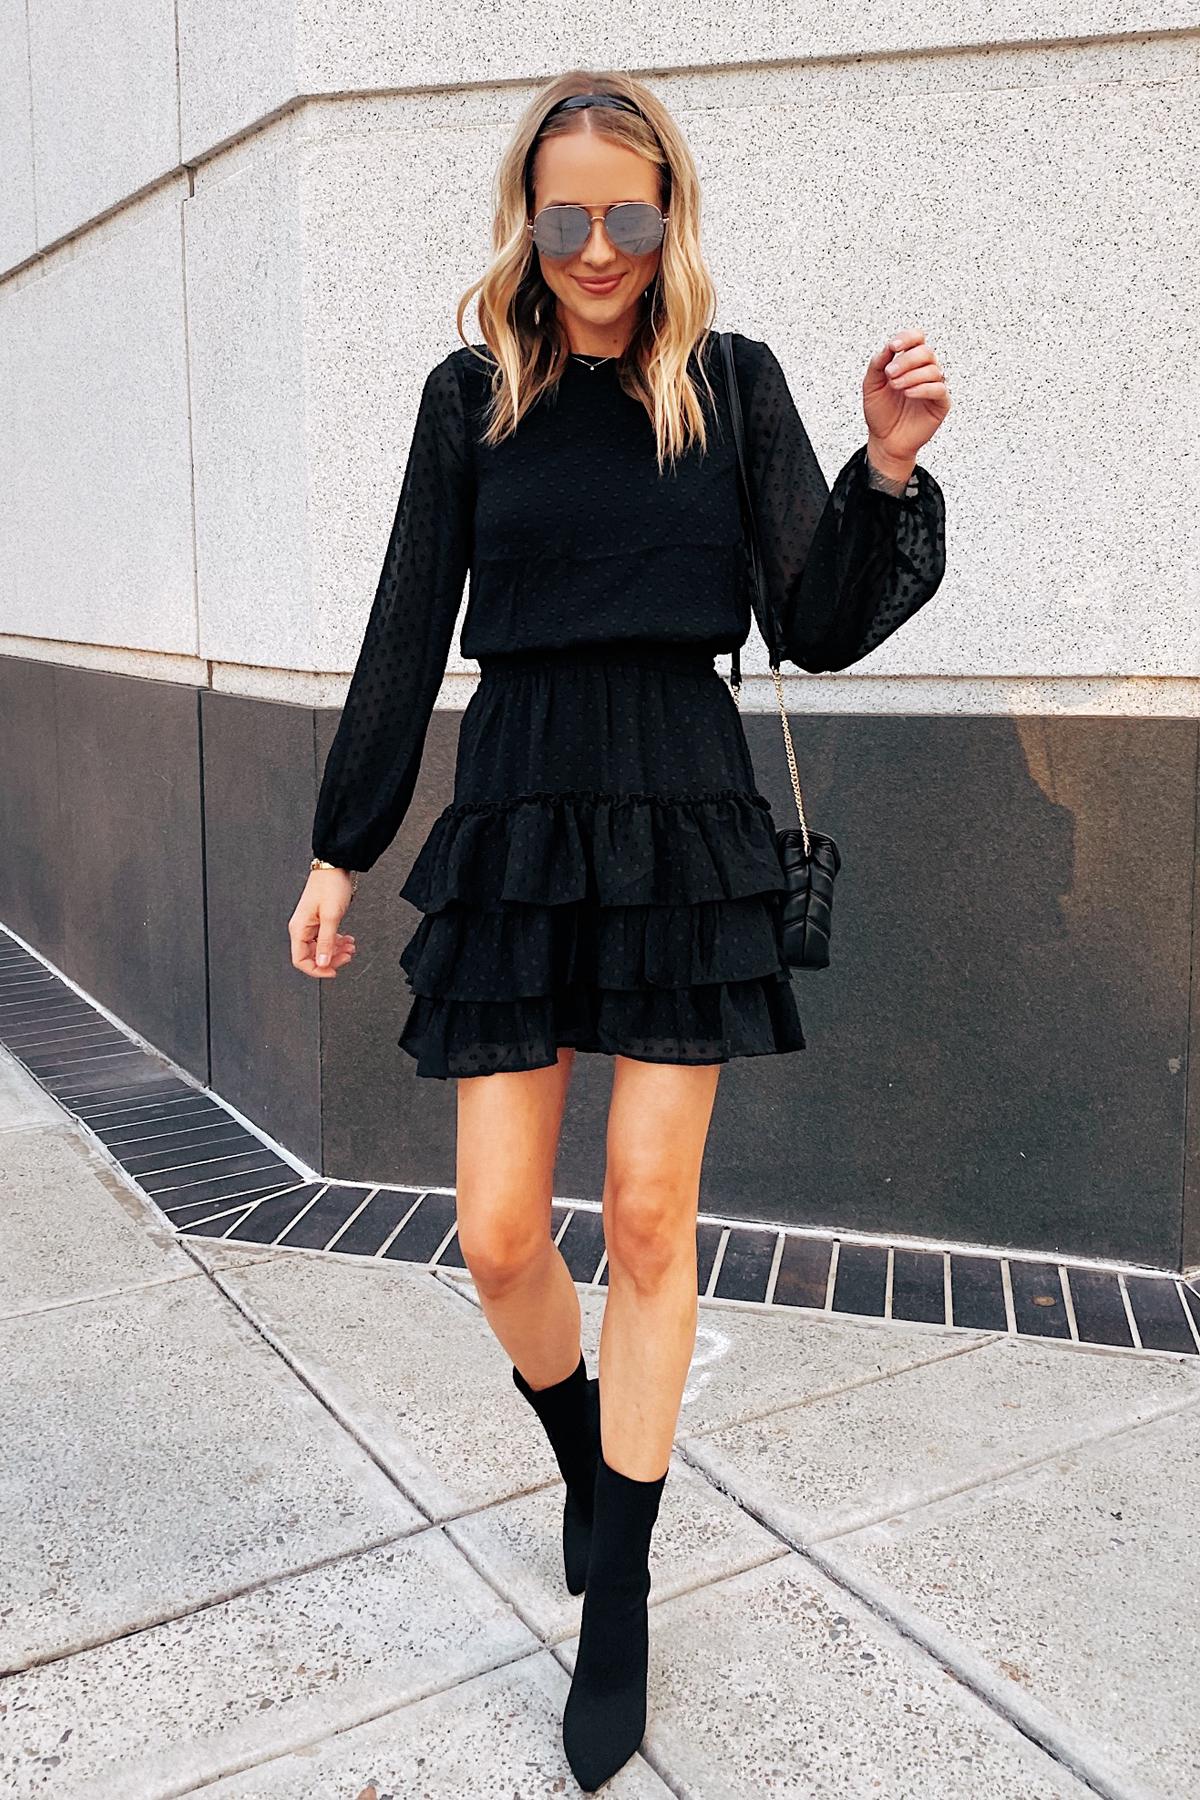 Fashion Jackson Wearing Little Black Dress Black Booties NYE Outfit